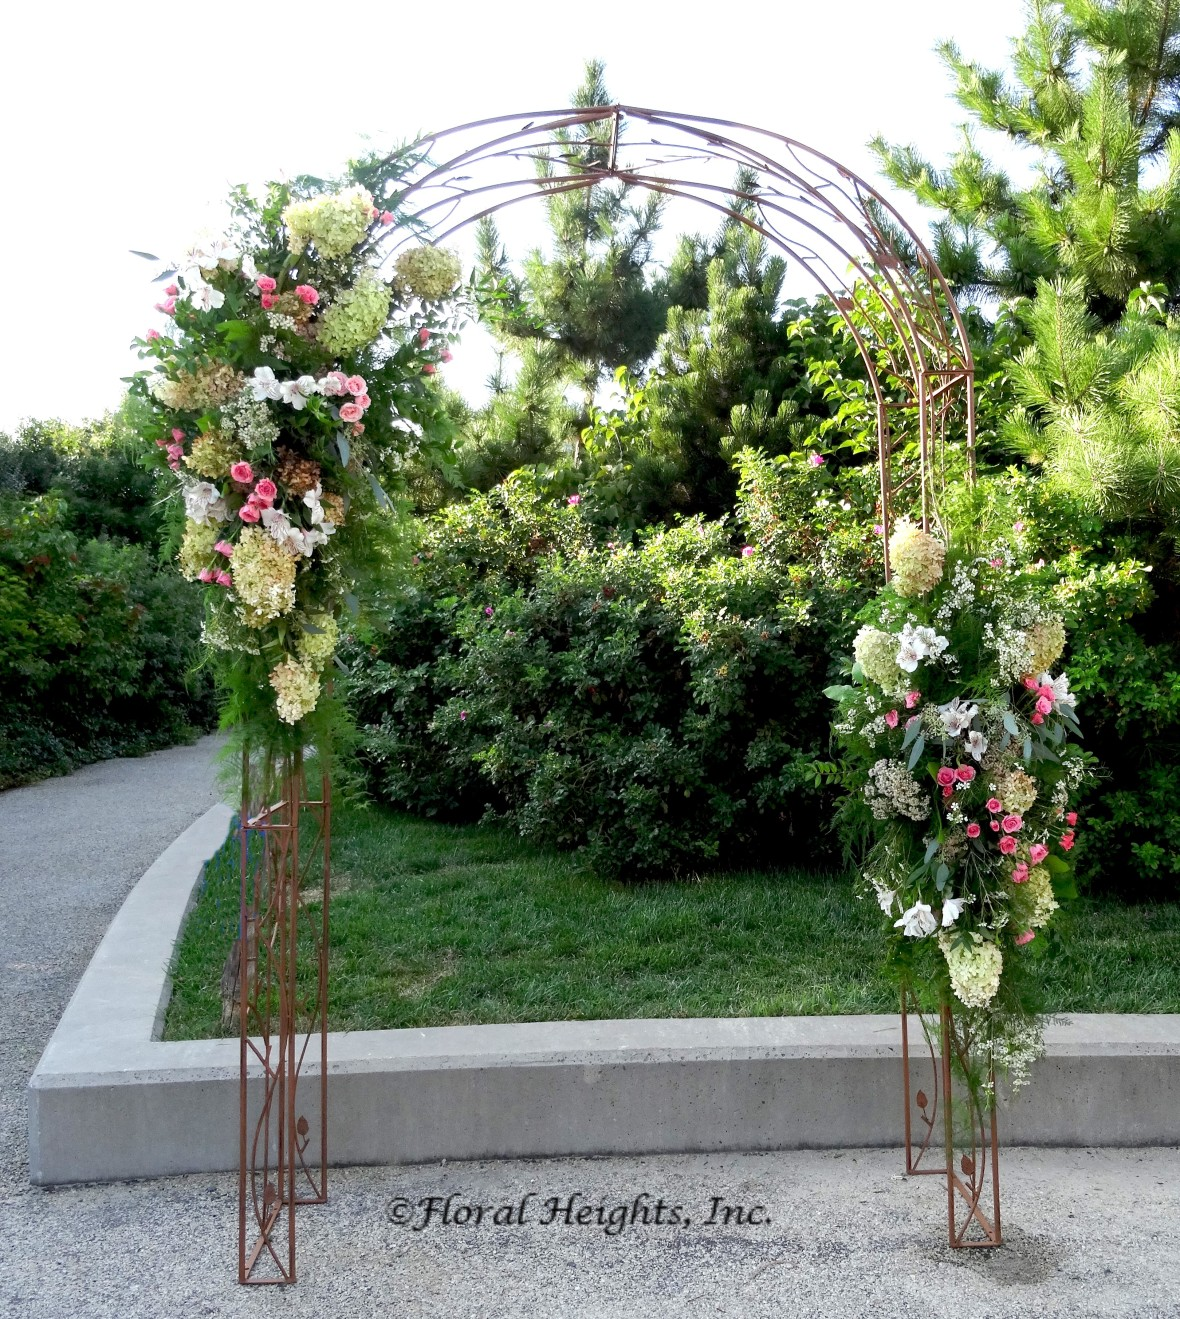 Deity Events Flower Arrangement